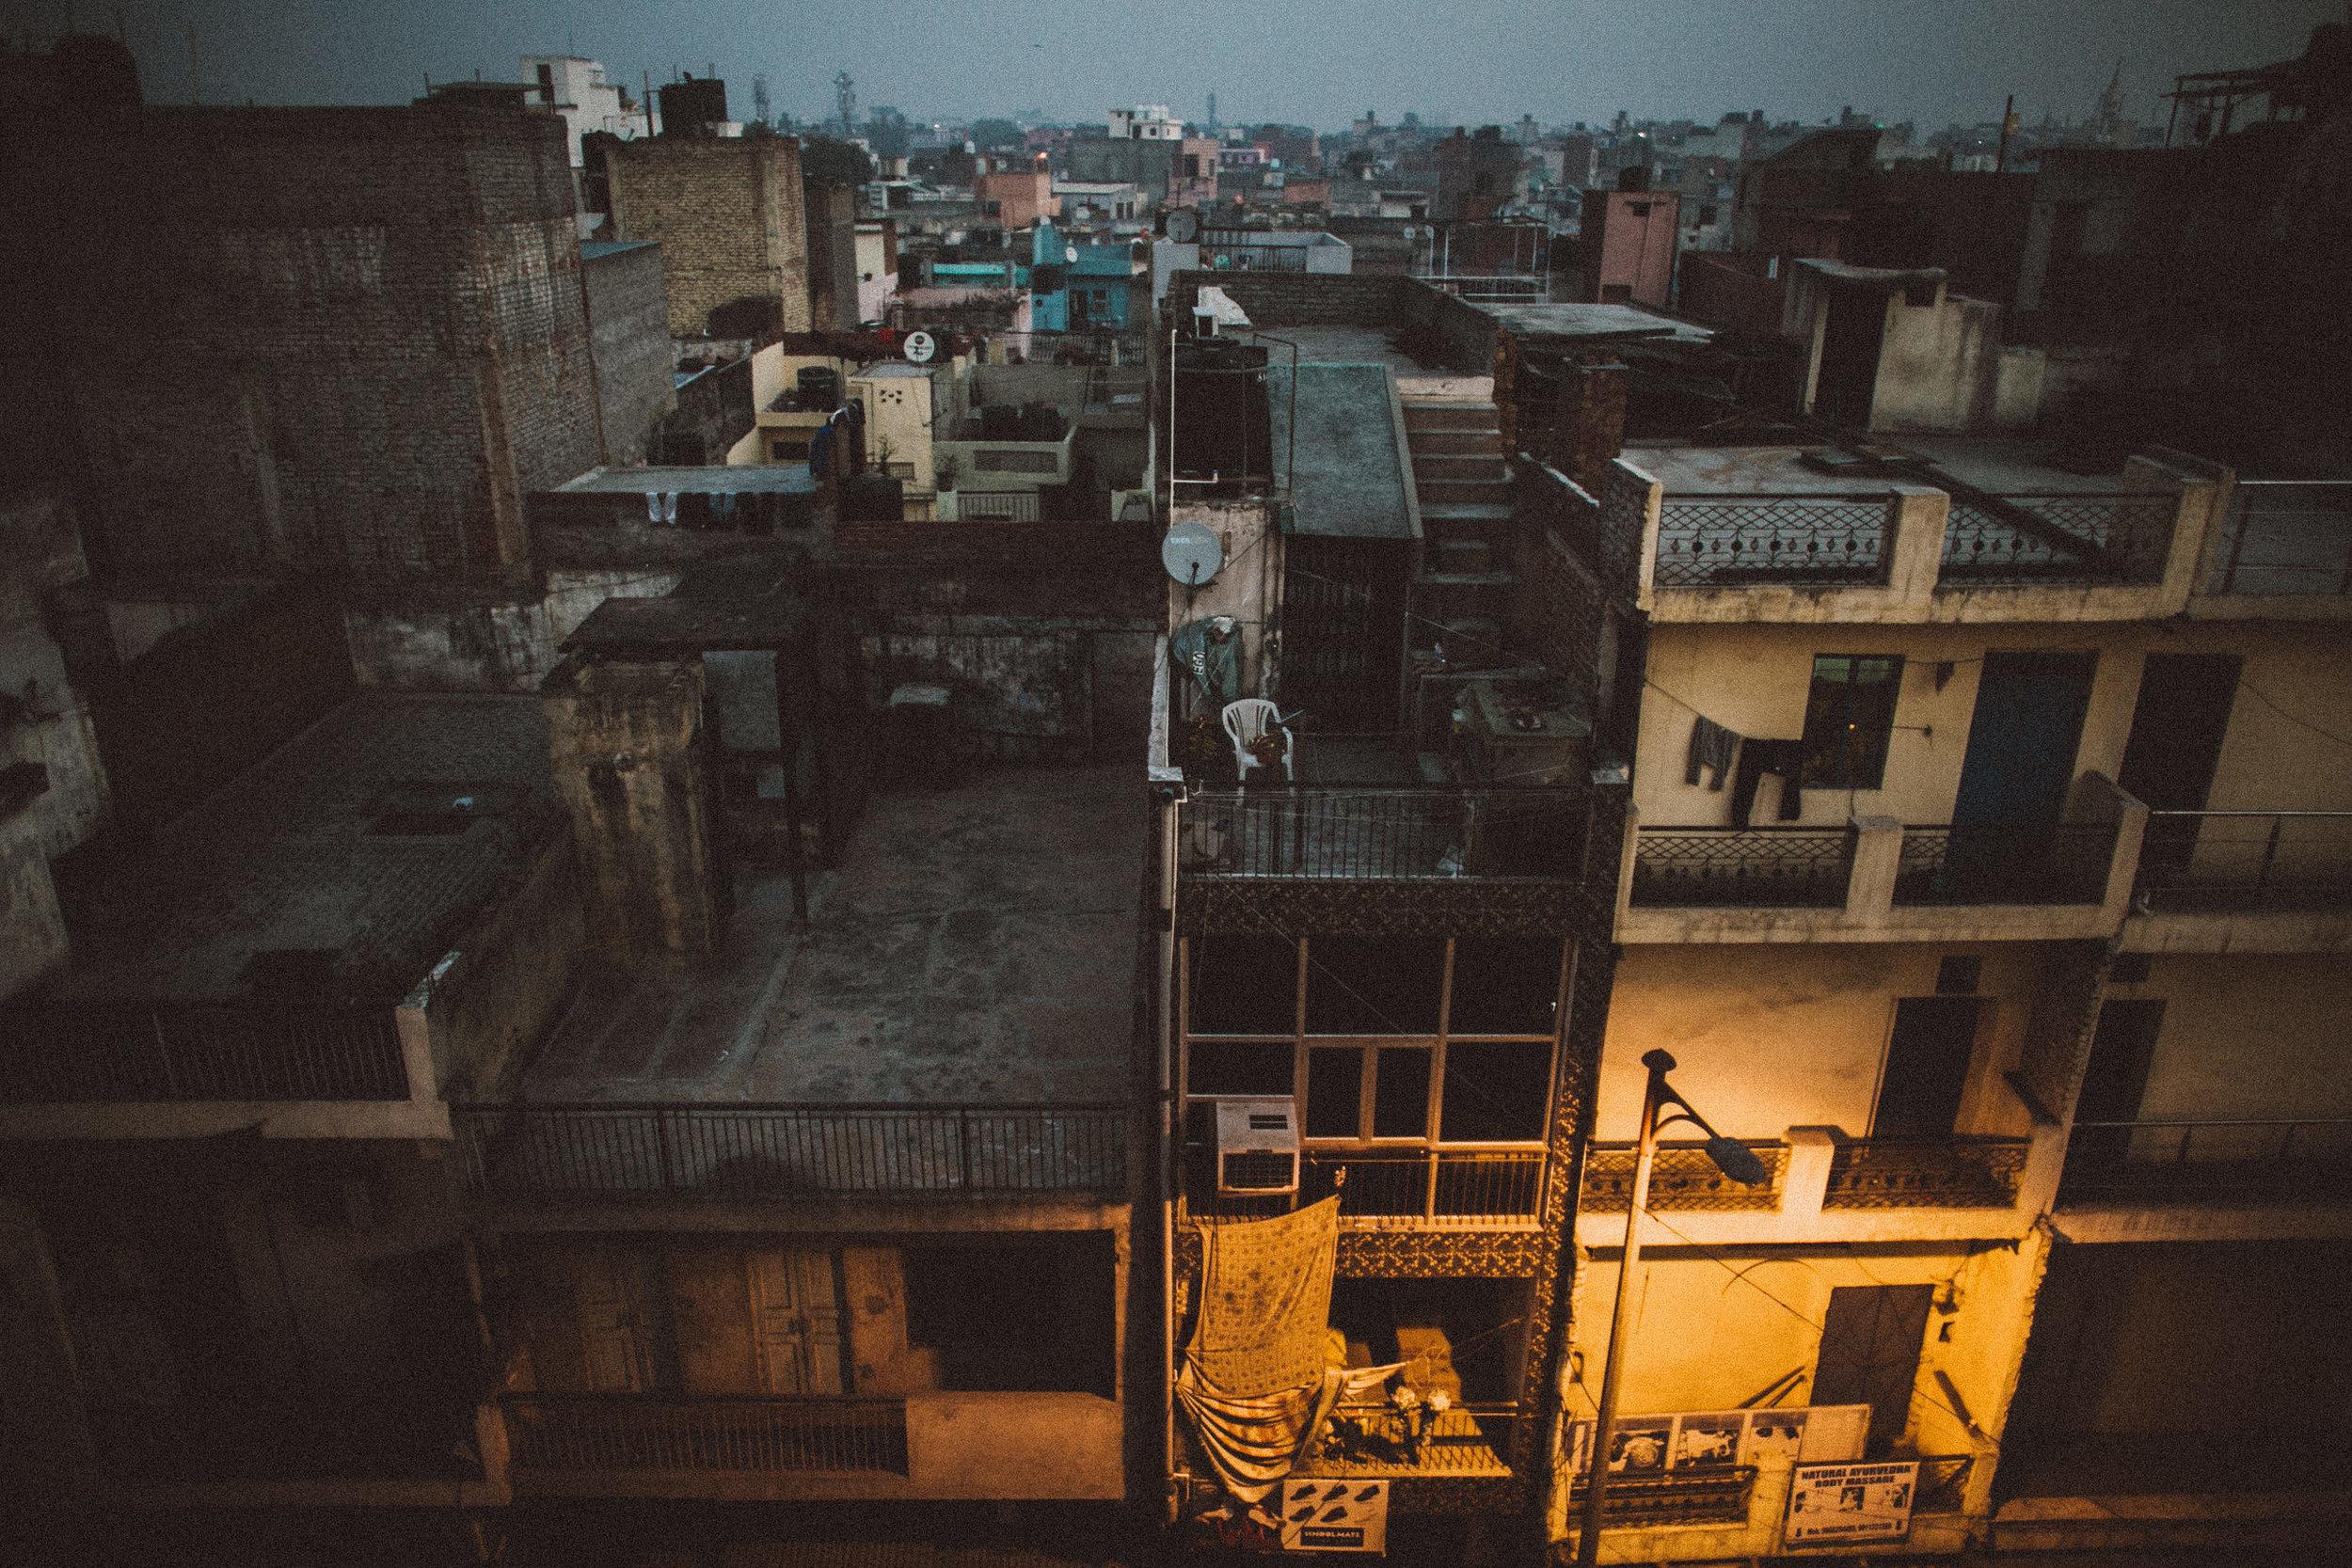 AFFOB_INDIA_20151101.JPG